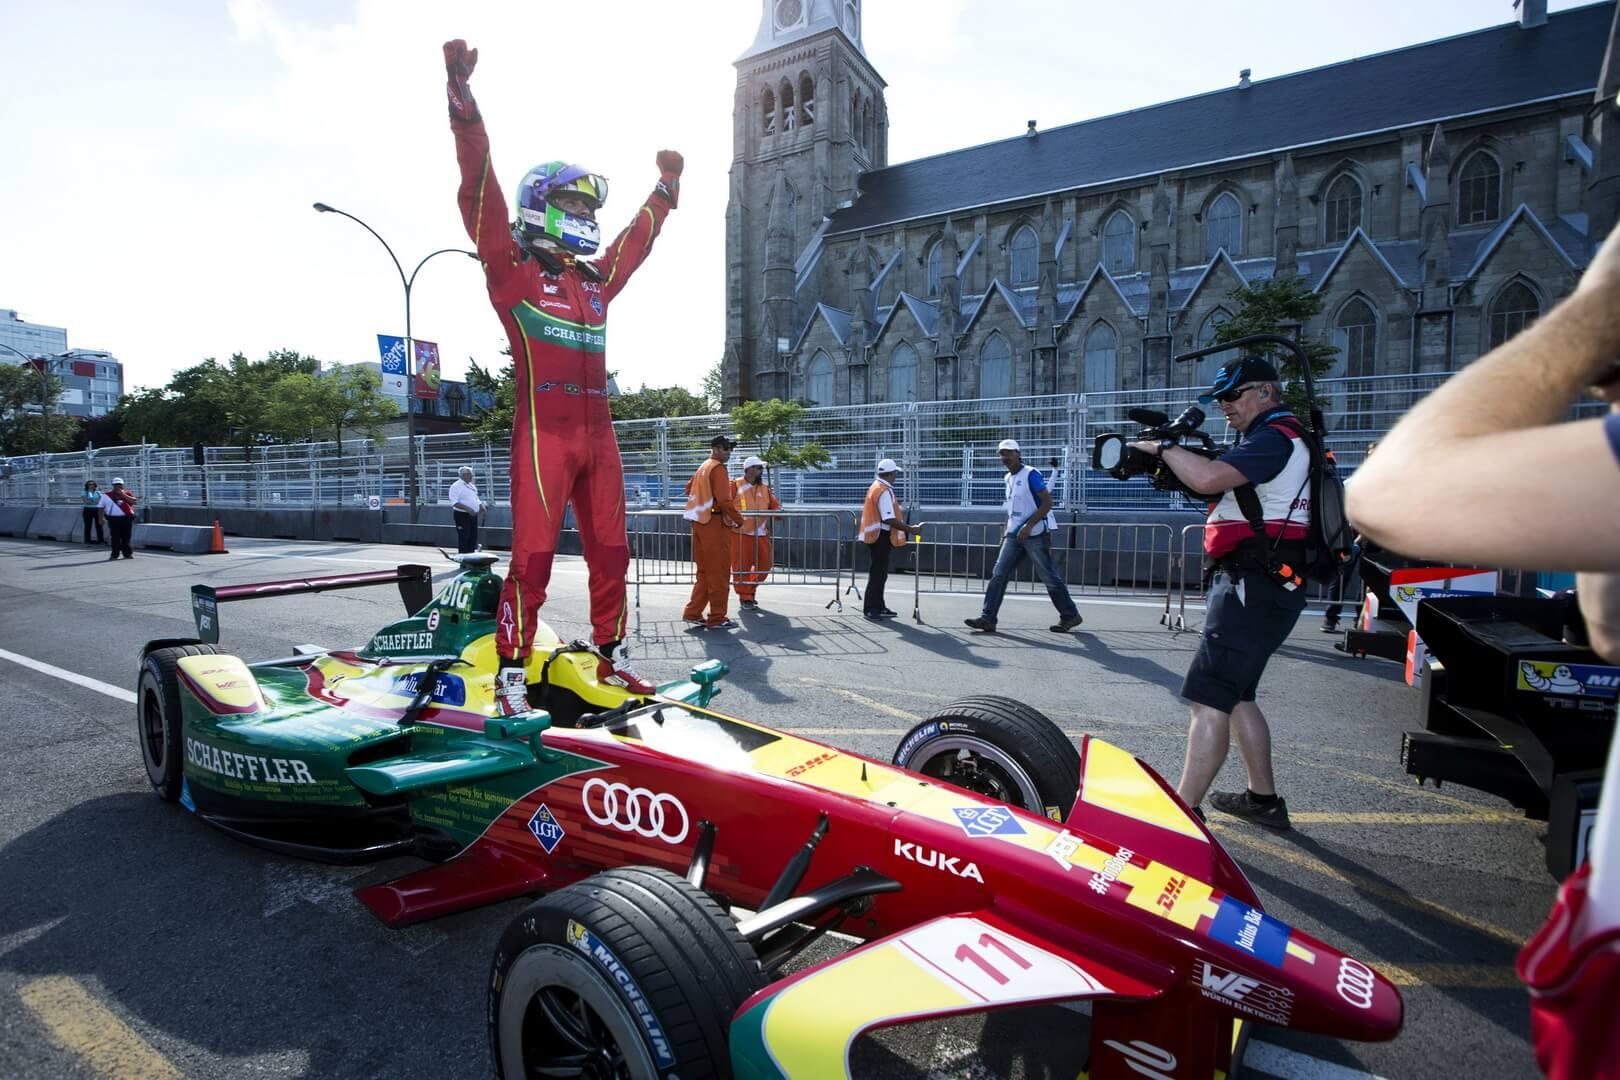 Победитель Лукас ди Грасси от команды Audi в Formula E 2016/2017